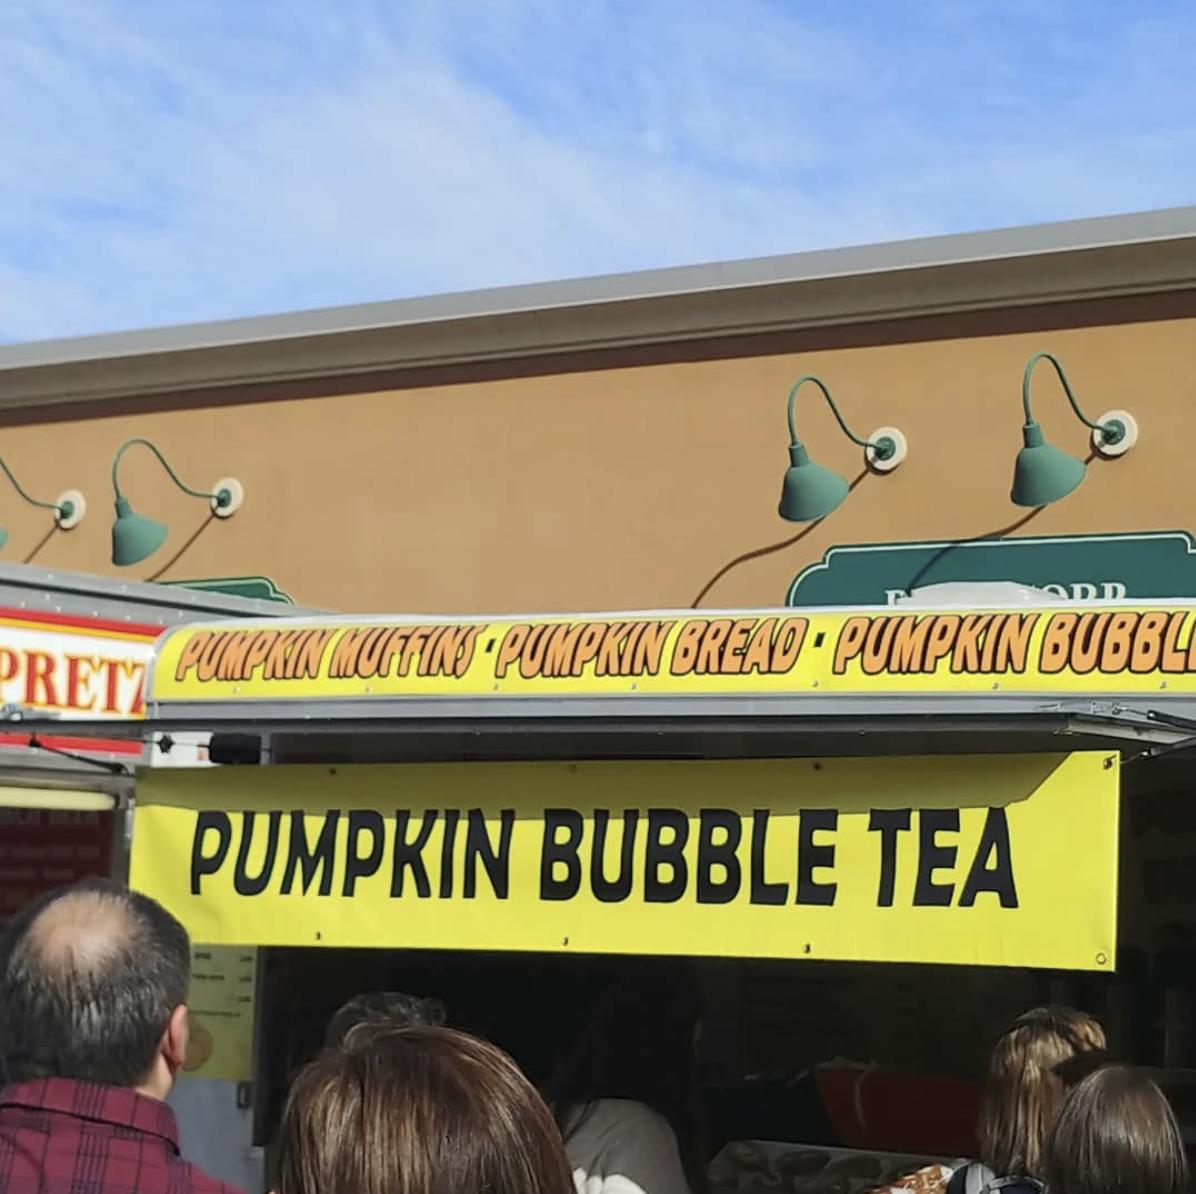 Sign for pumpkin bubble tea